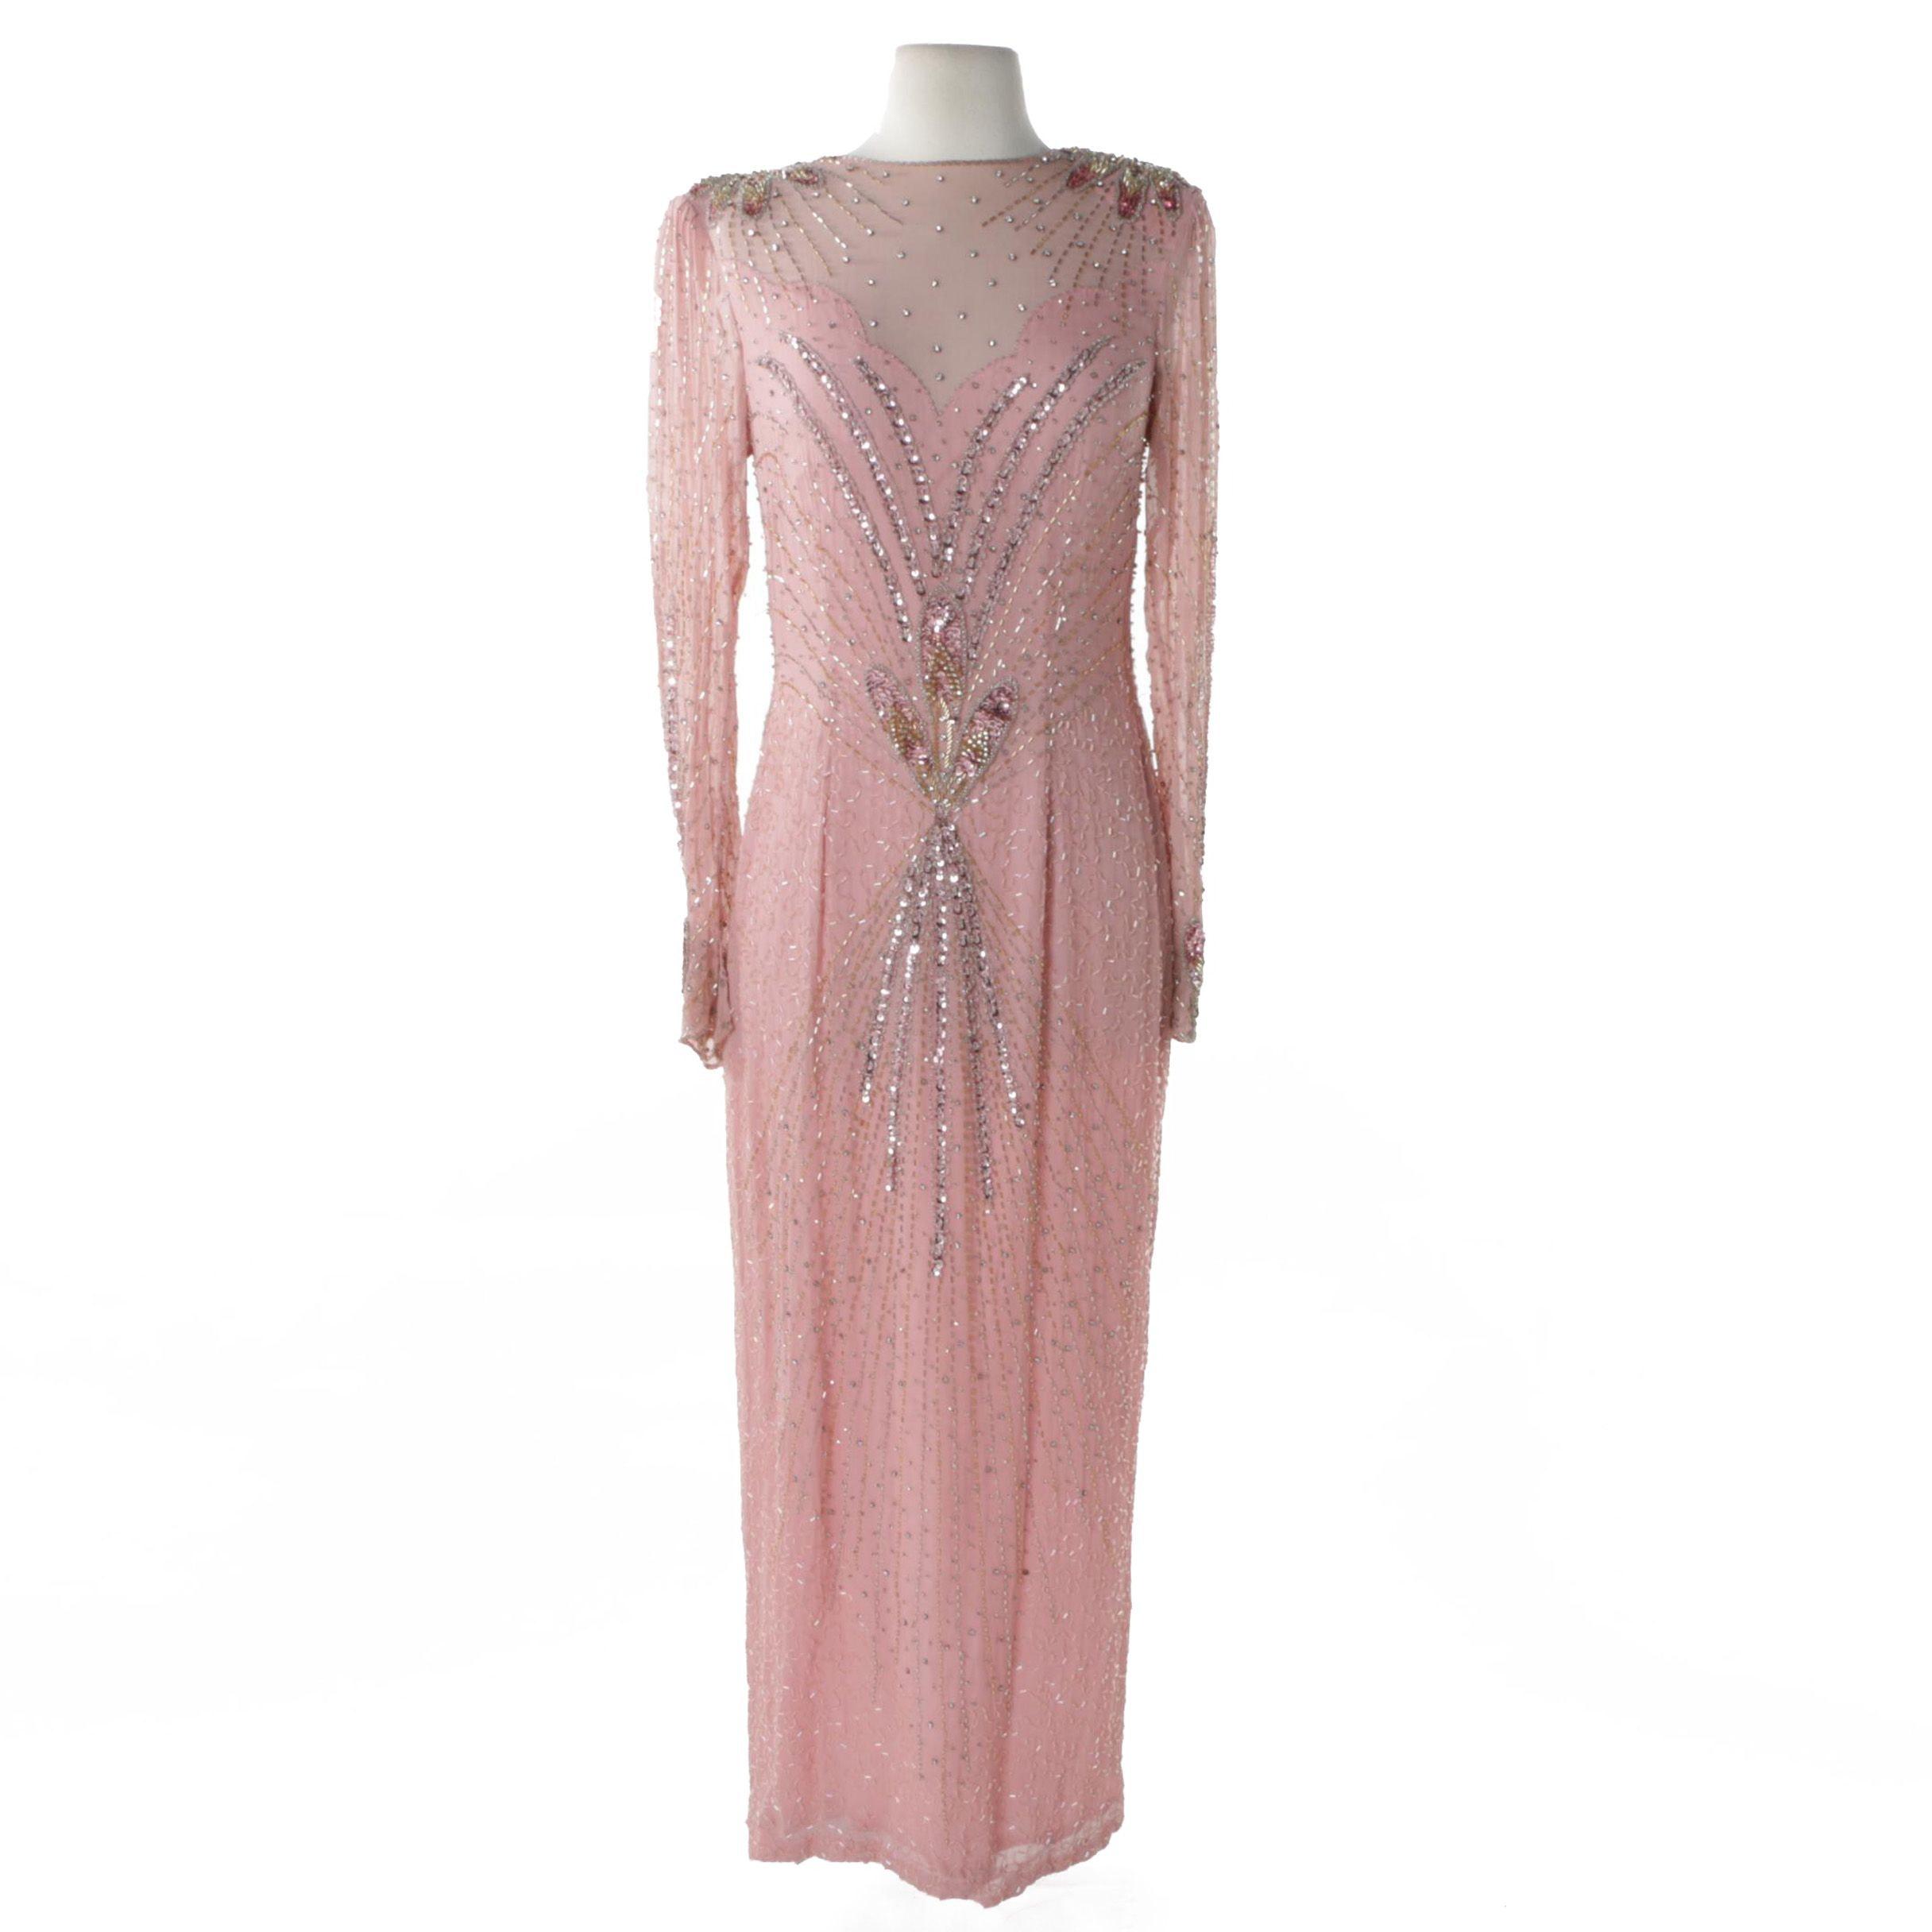 Landa Pink Silk Embellished Evening Dress with Illusion Yoke